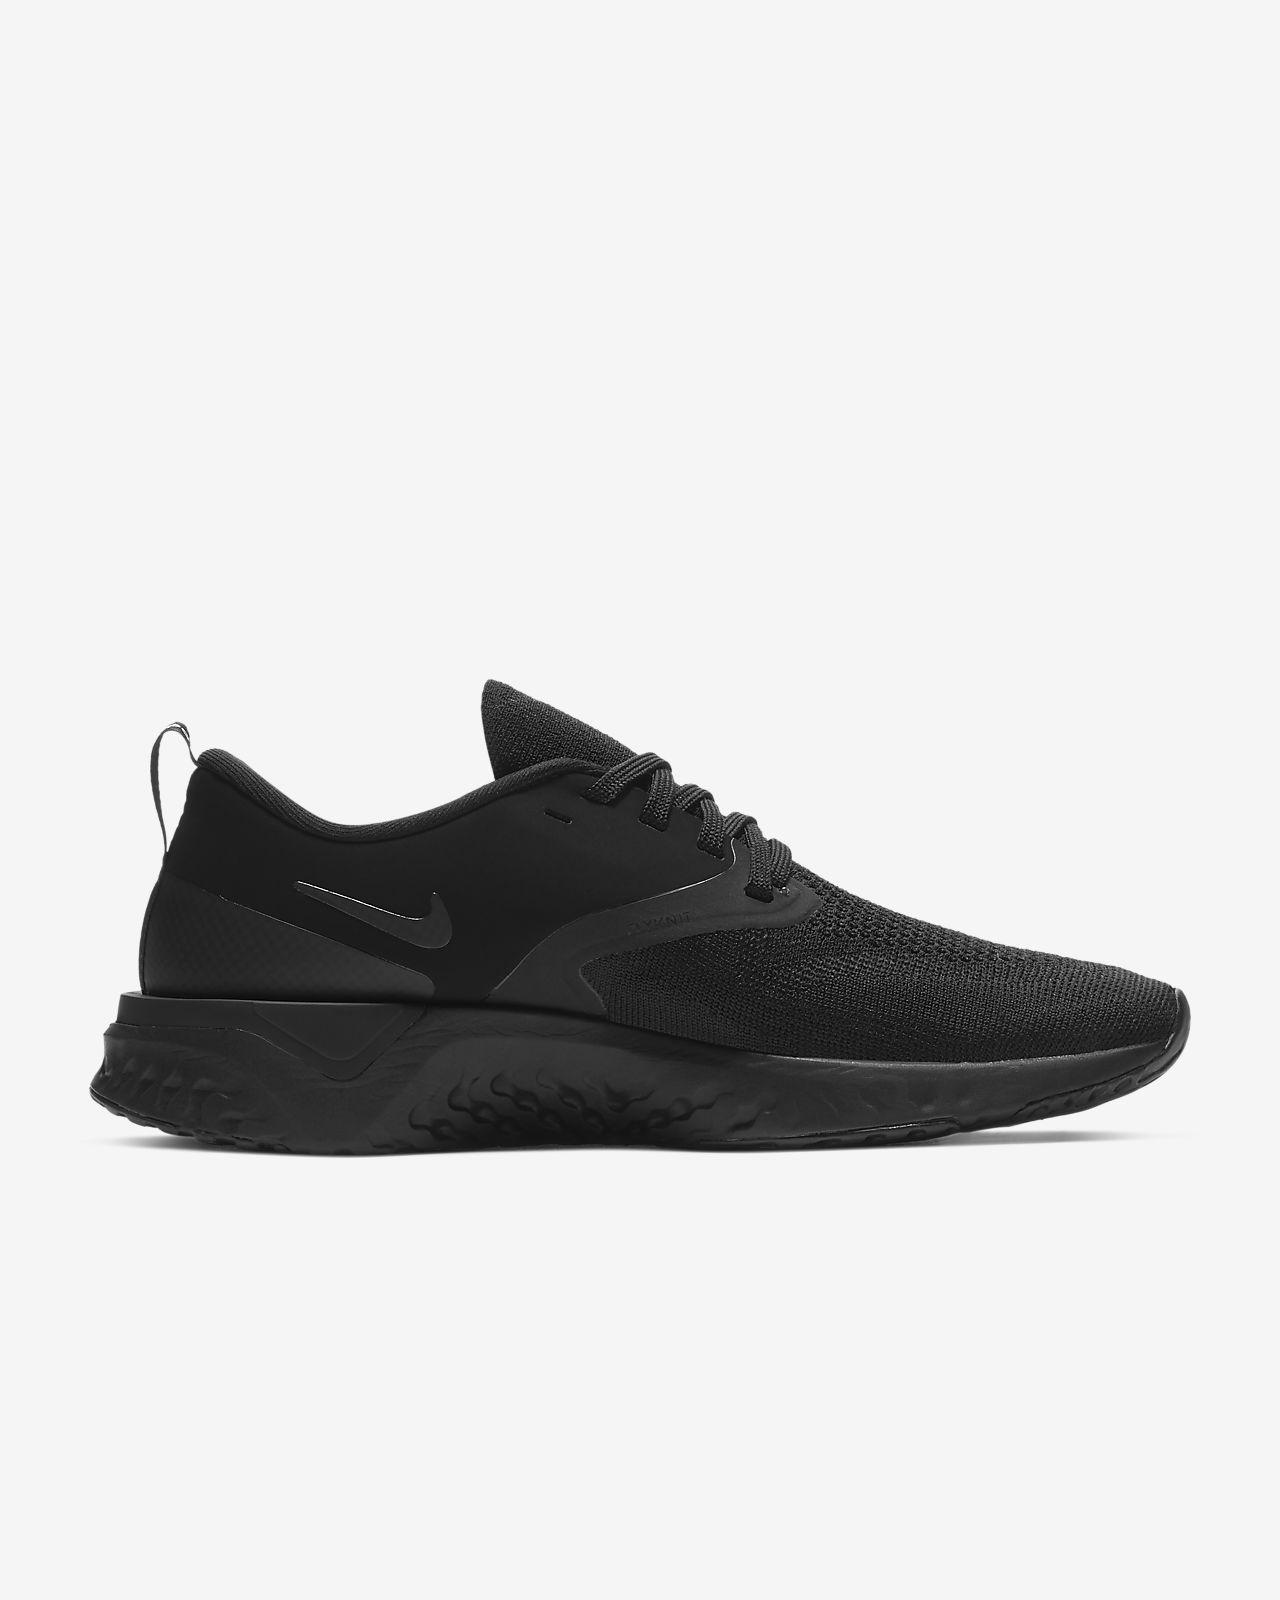 ed839c58623d2 Nike Odyssey React Flyknit 2 Women s Running Shoe. Nike.com PT